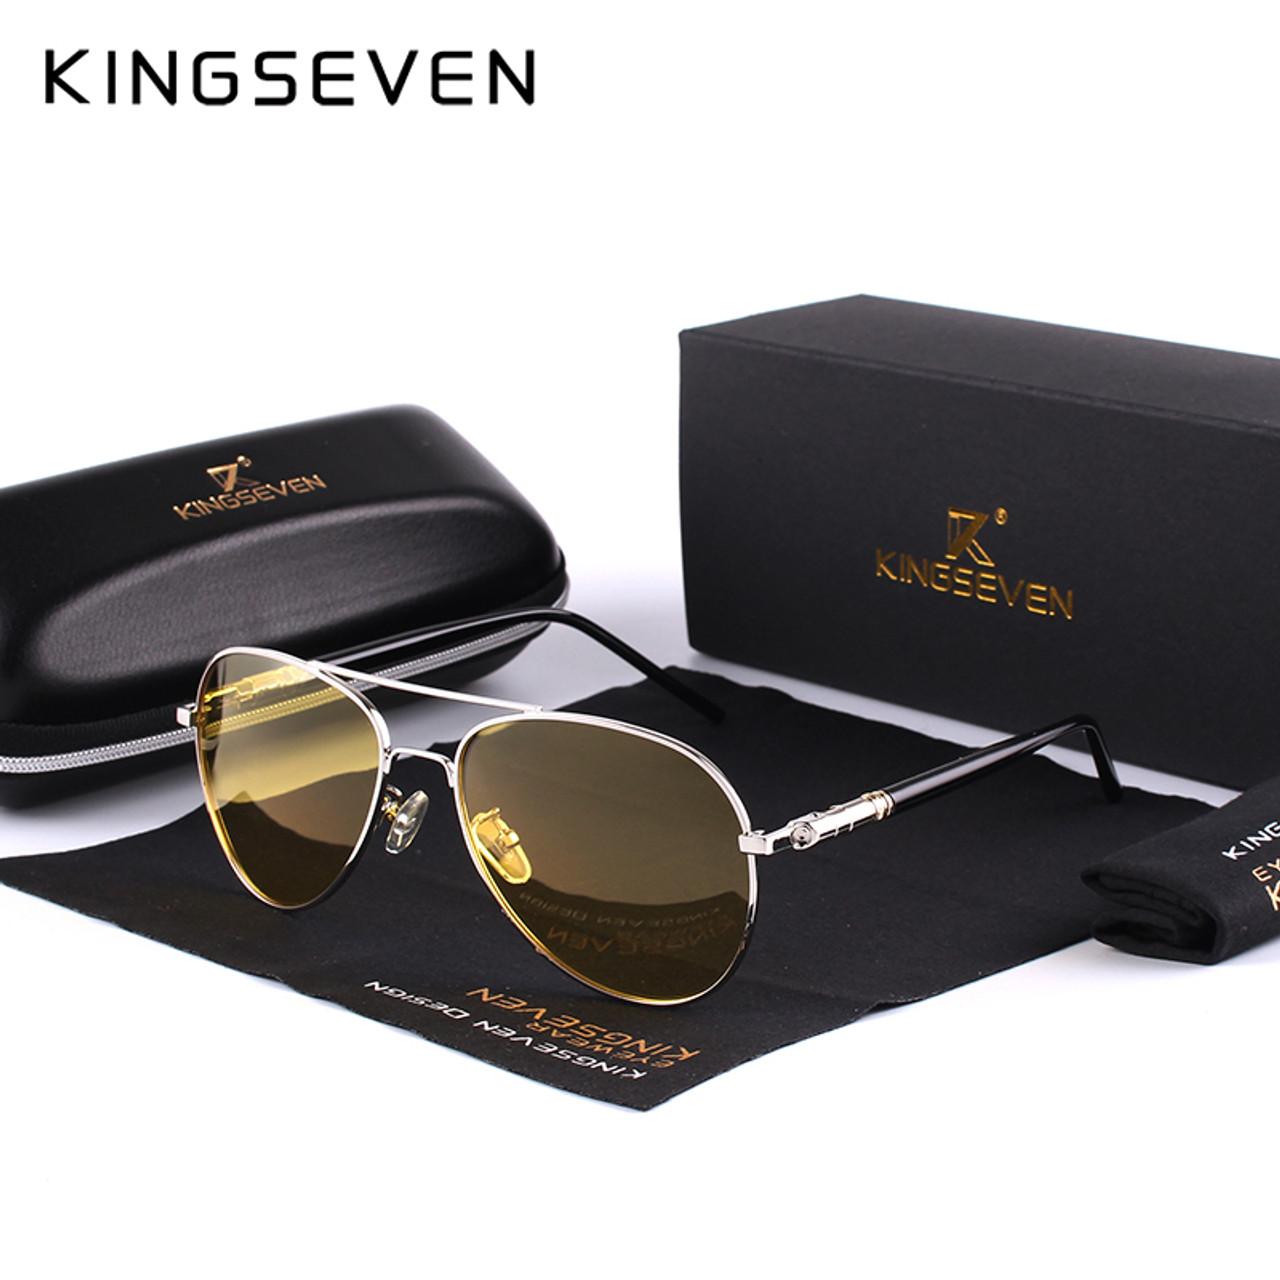 0d62fc9ed3 2017 Mens Polarized Night Driving Sunglasses Men Brand Designer Yellow Lens  Night Vision Driving Glasses Goggles Reduce Glare - OnshopDeals.Com